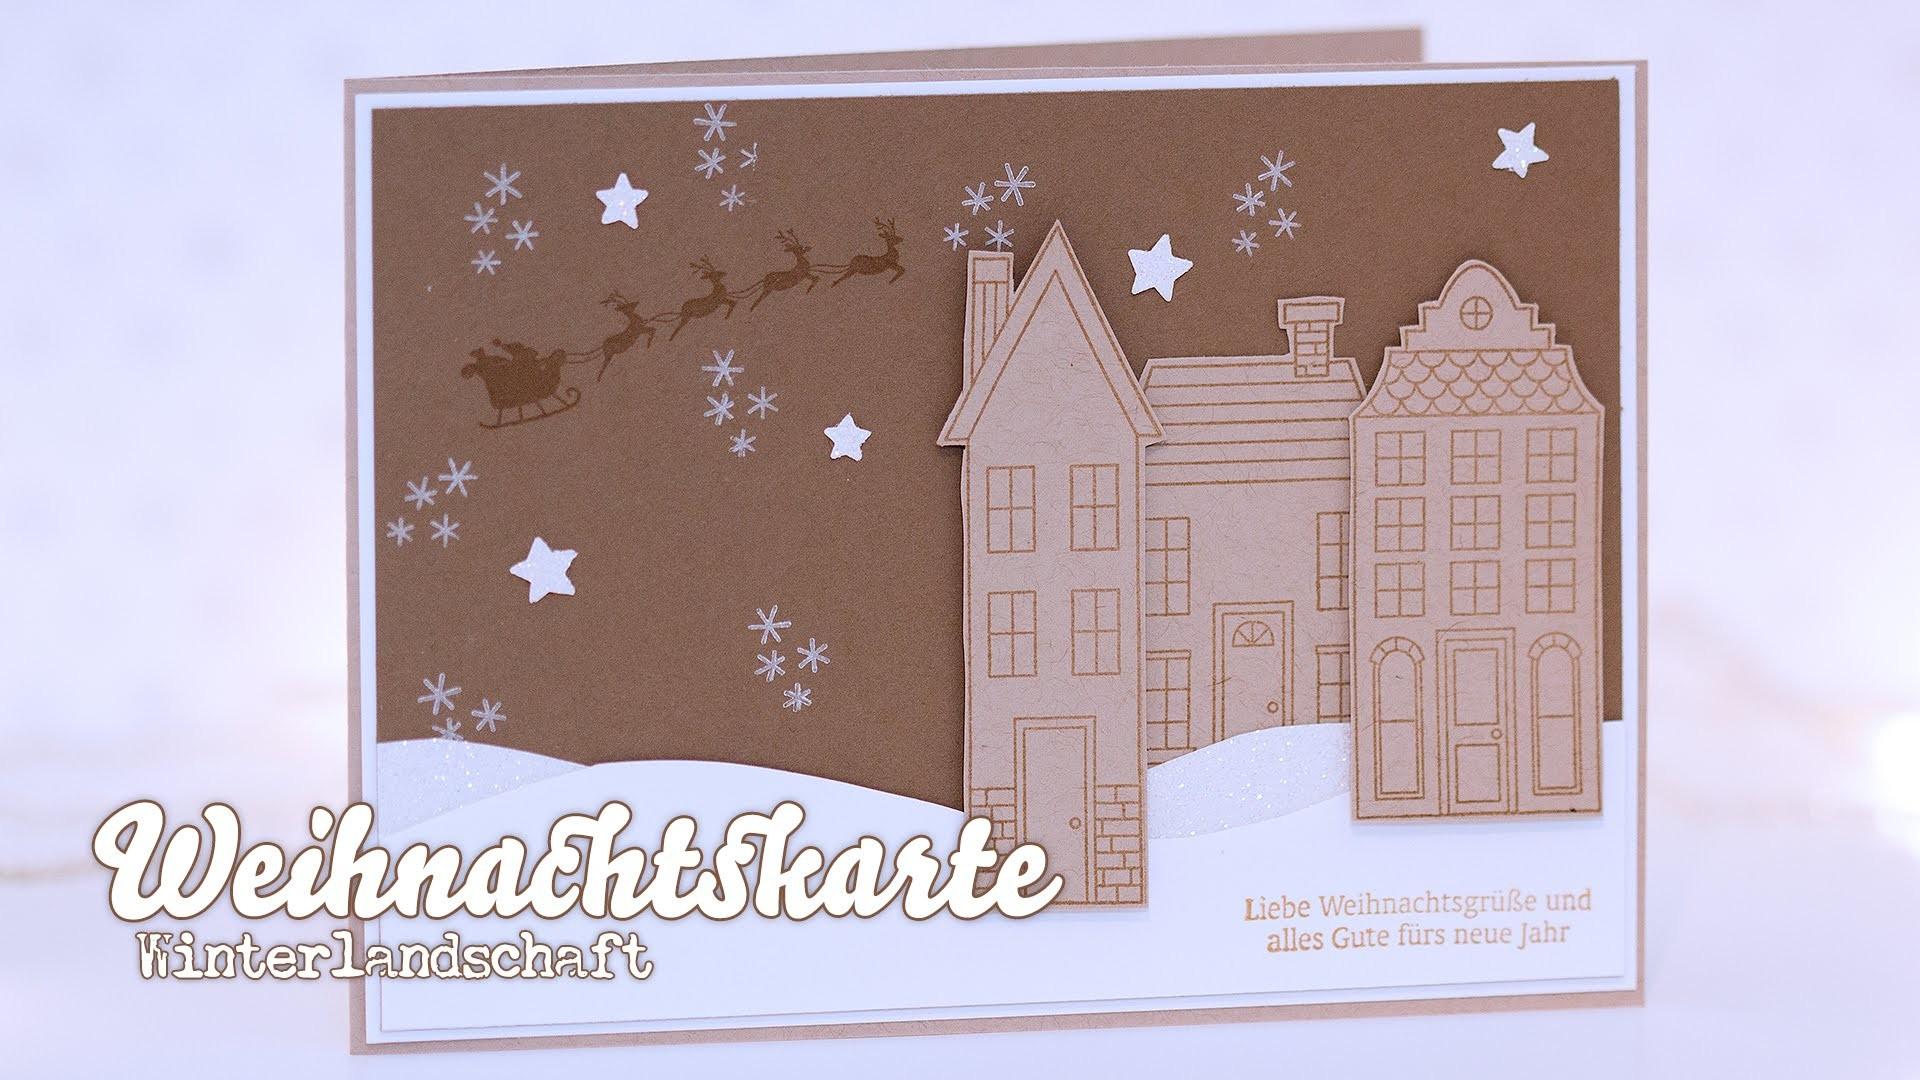 Stampin' Up! - How I make a christmas card - Weihnachtskarte - Winterlandschaft